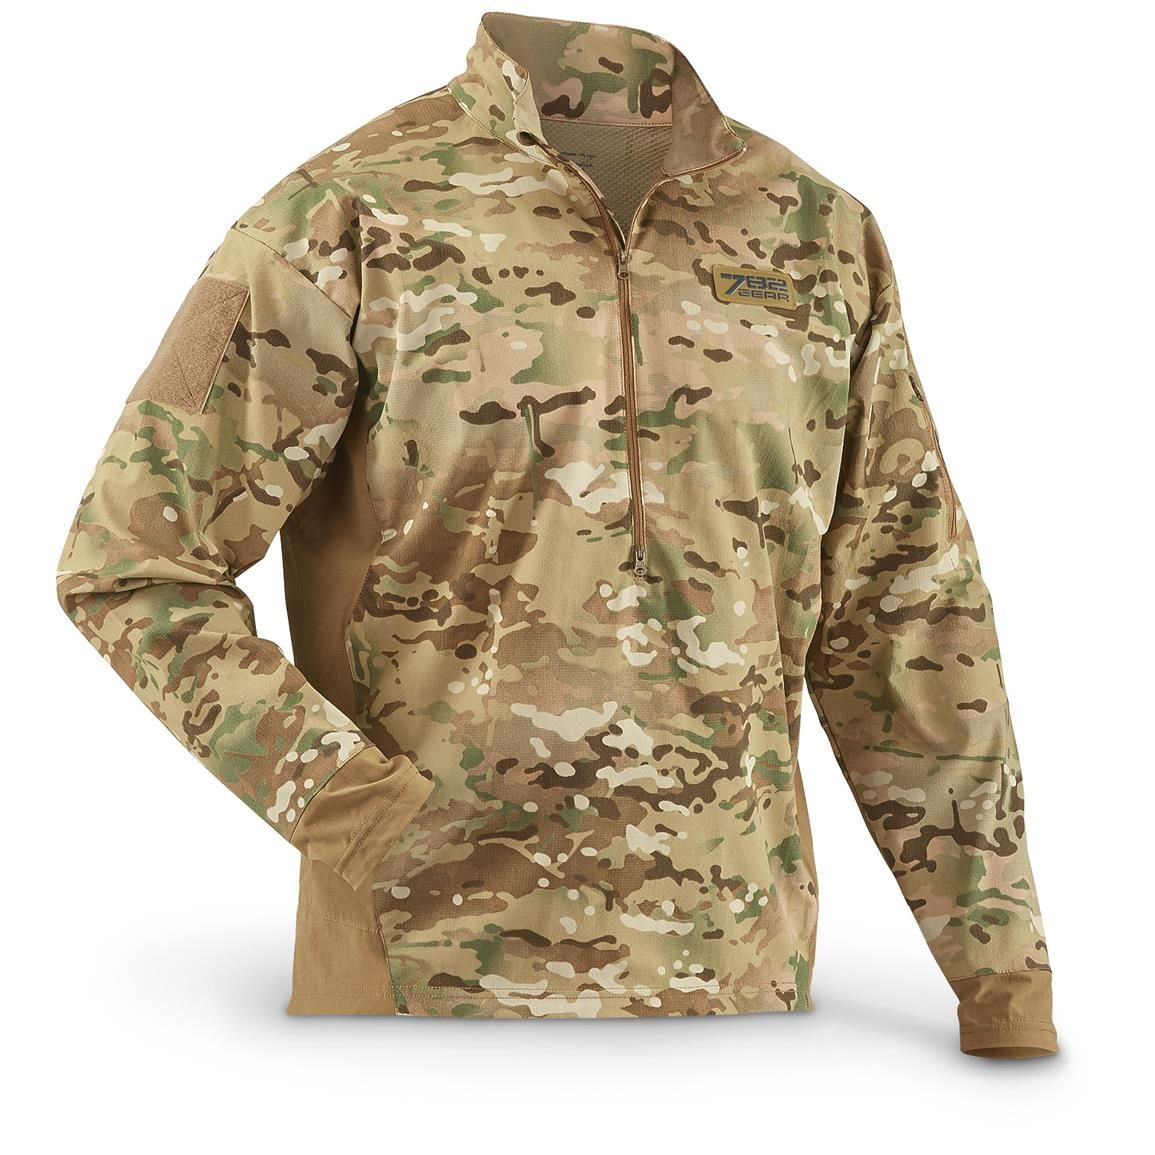 37fafc916df New Men s U.S. Military Surplus Velocity Waterproof MultiCam 1 4-zip Anorak  Jacket